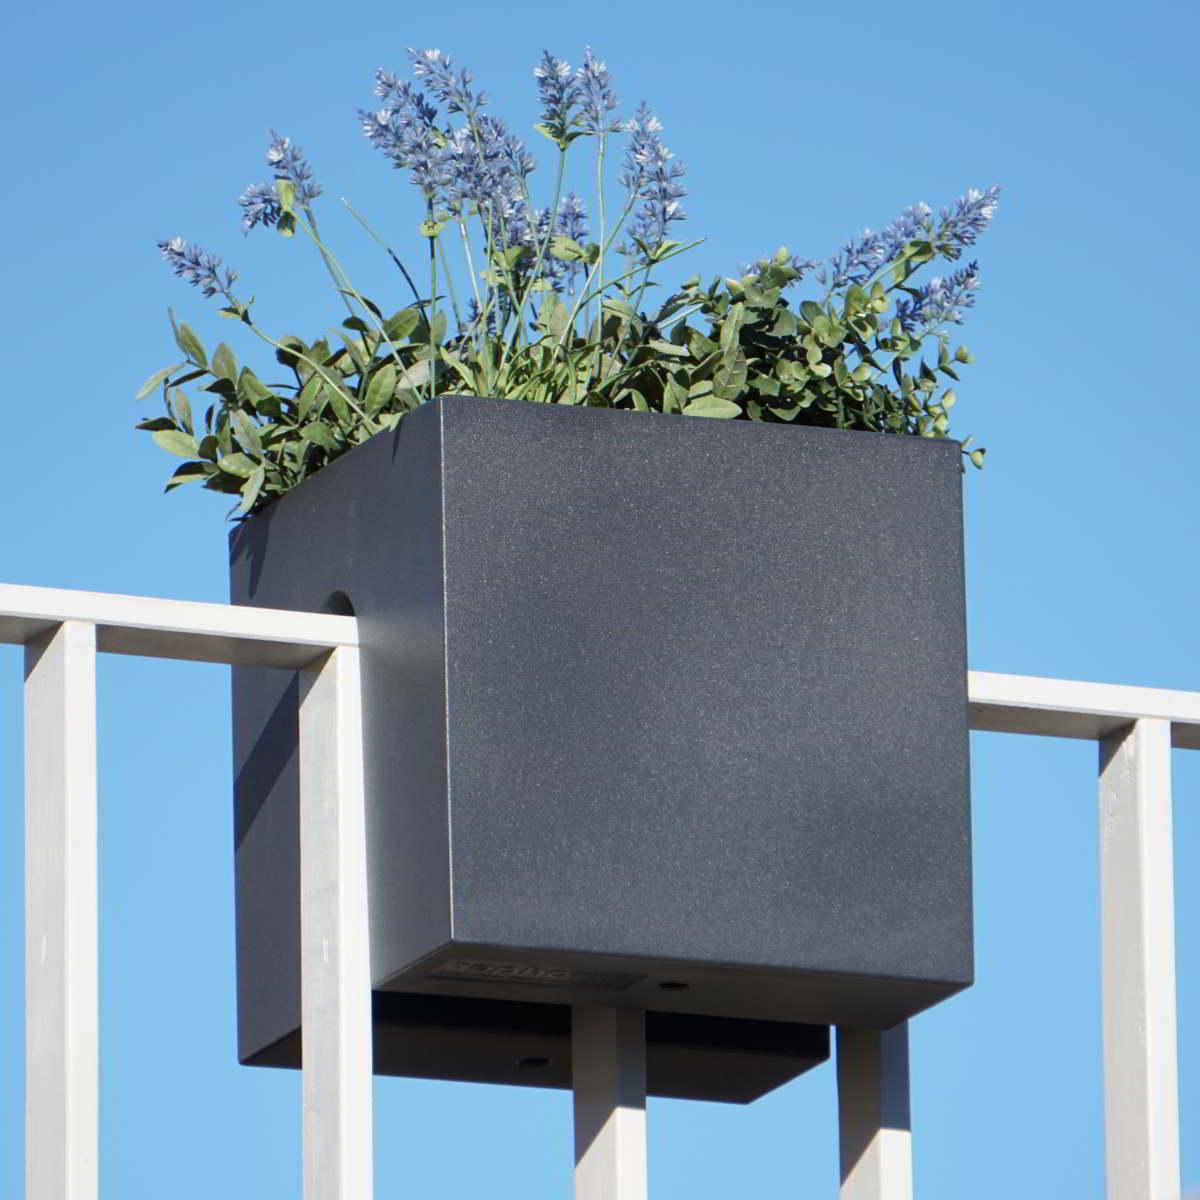 STECKLING CUBE Balkon Pflanzgefäß